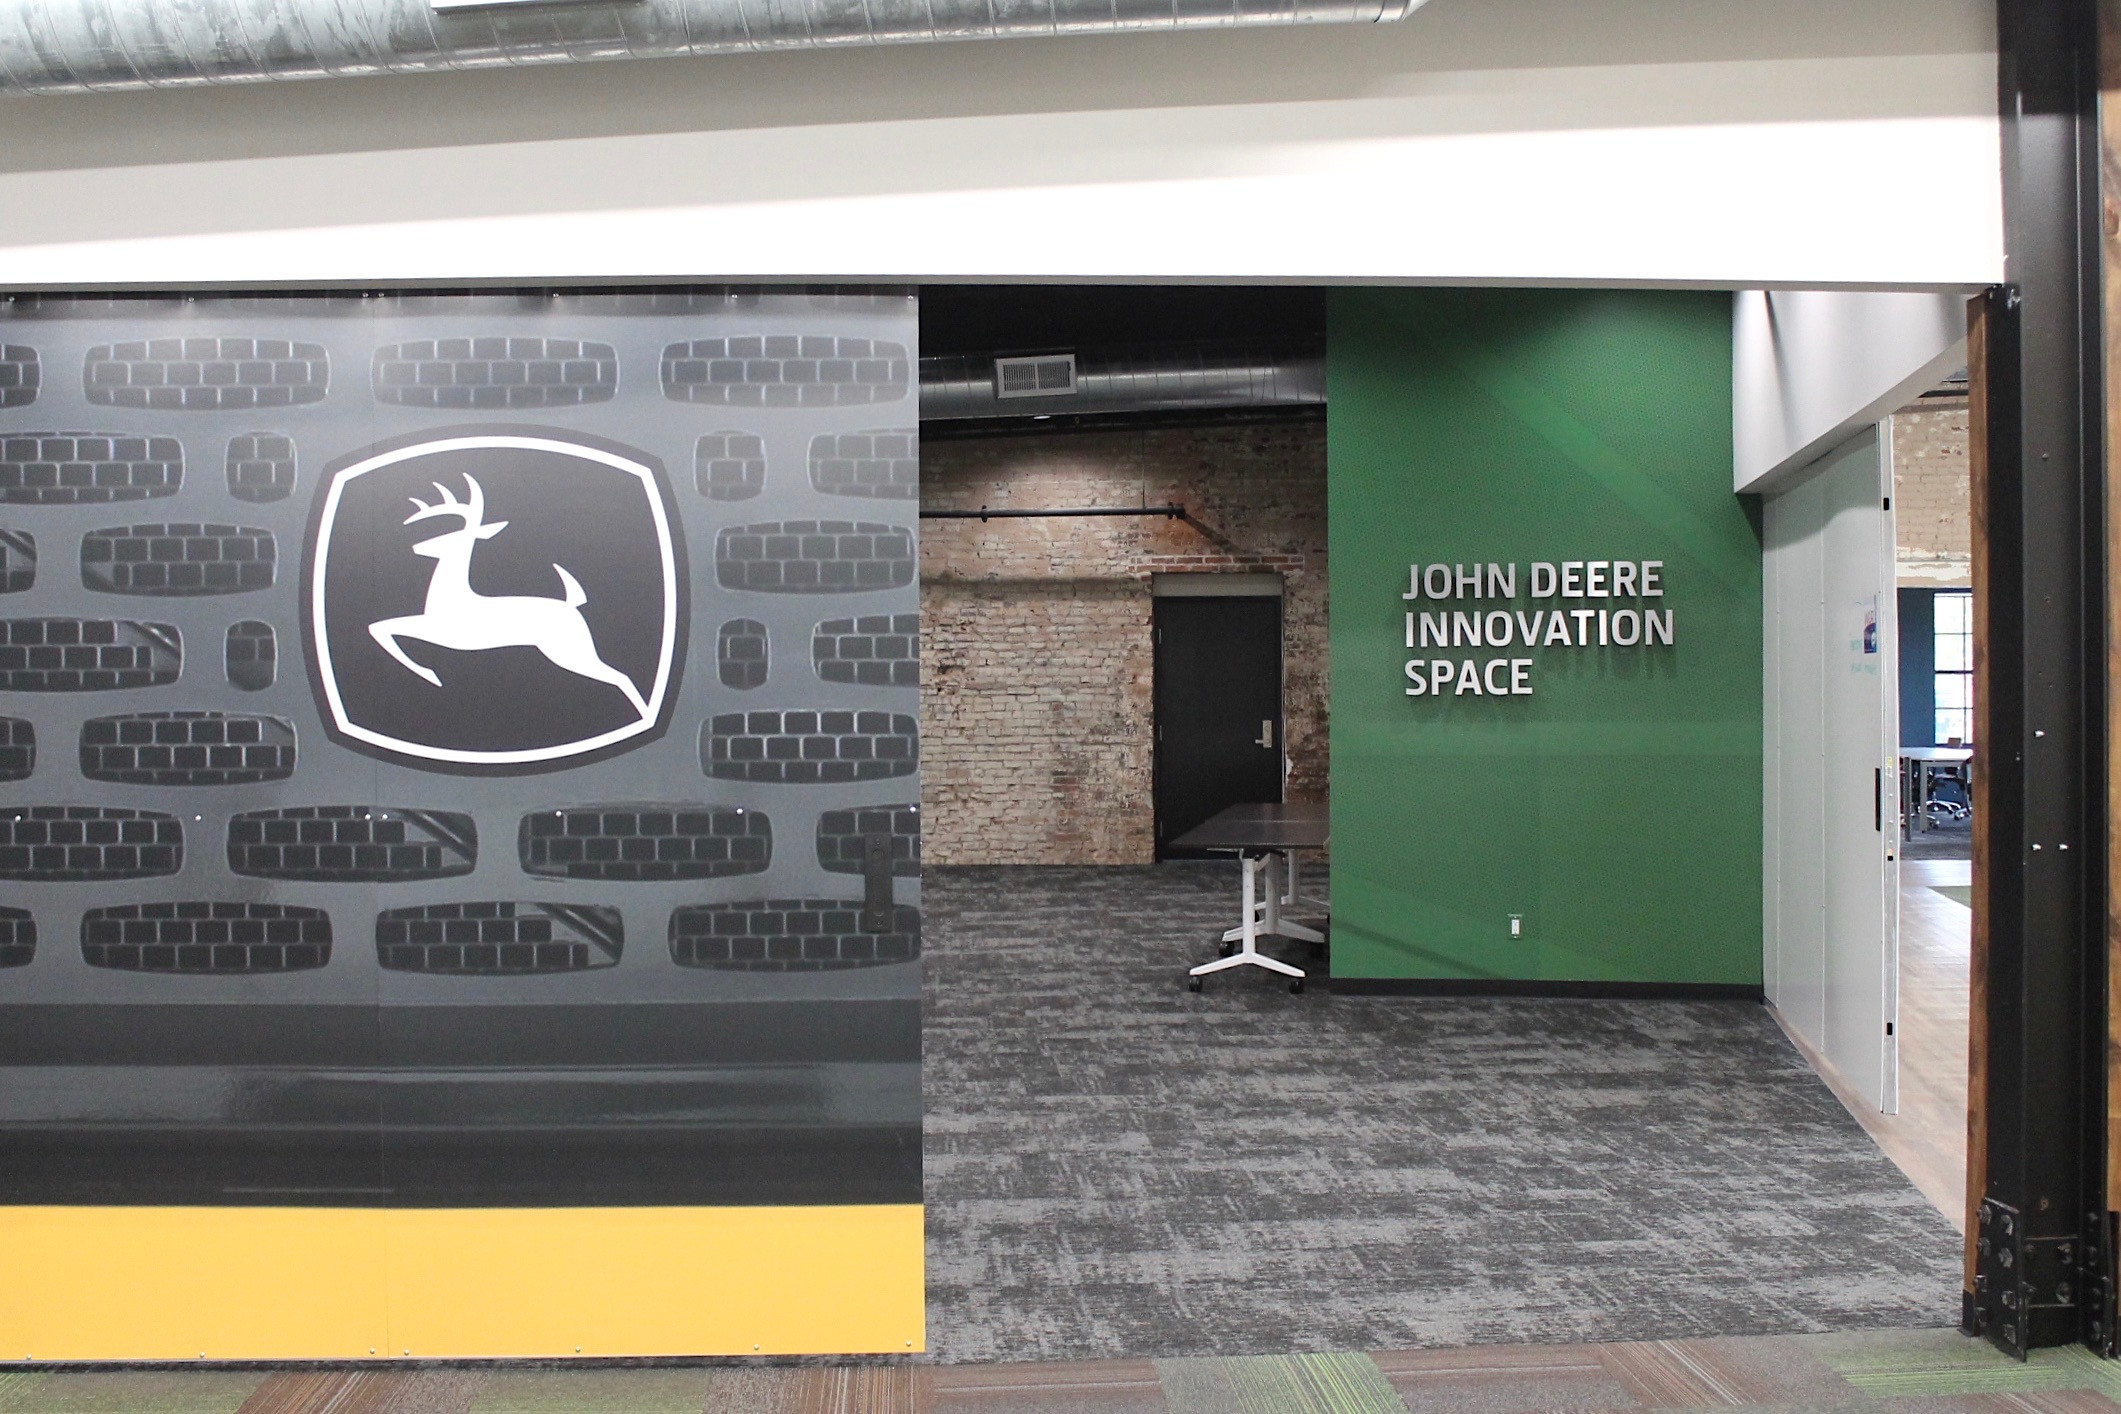 John Deere Innovation Space - 1/2 Day